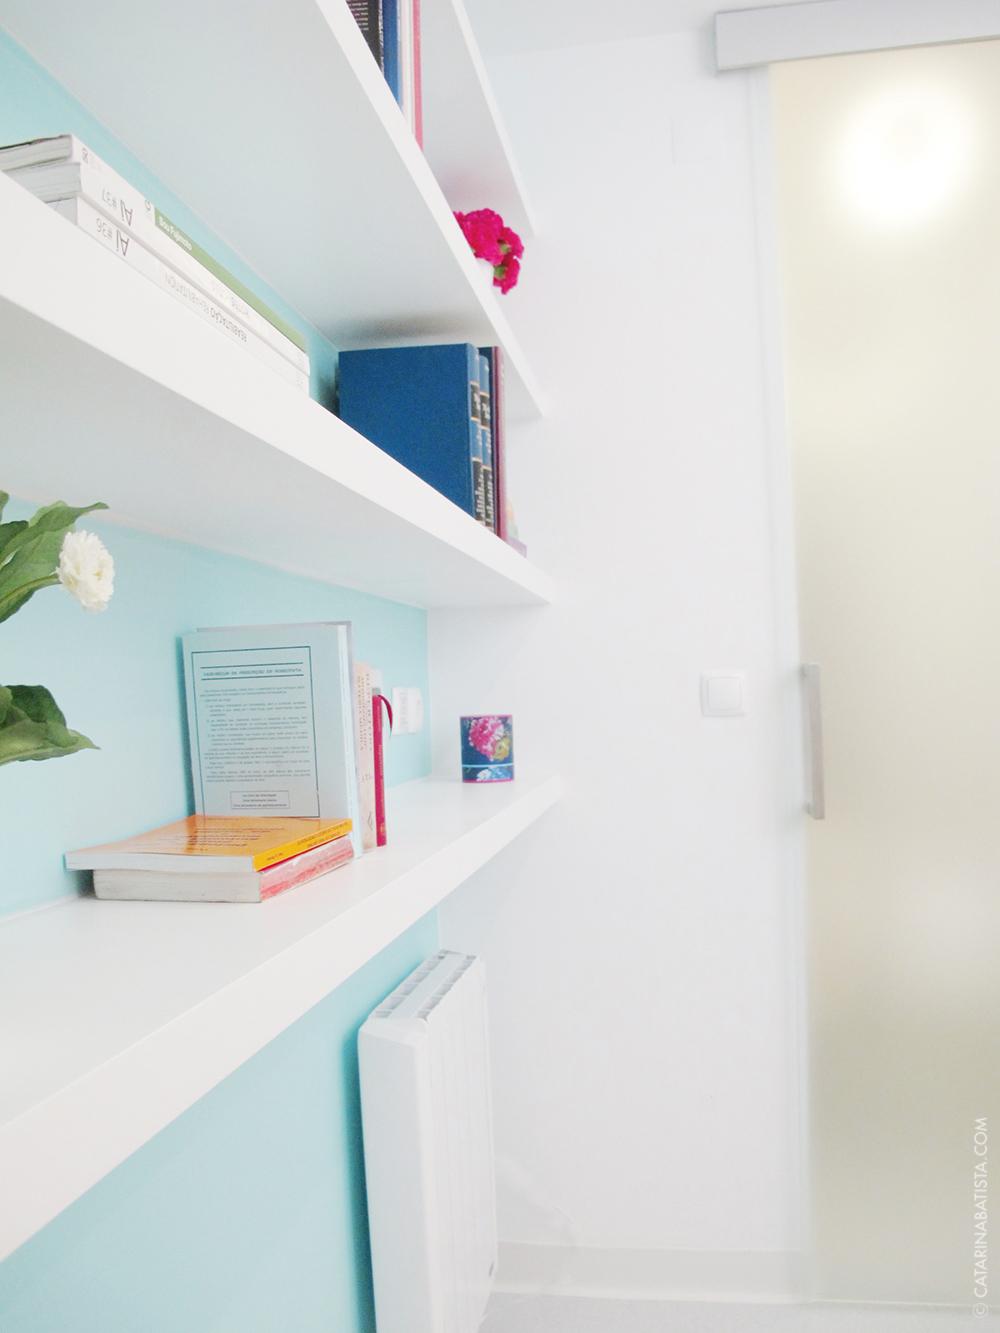 007-catarina-batista-arquitectura-design-interior-decoracao-clinicia.jpeg